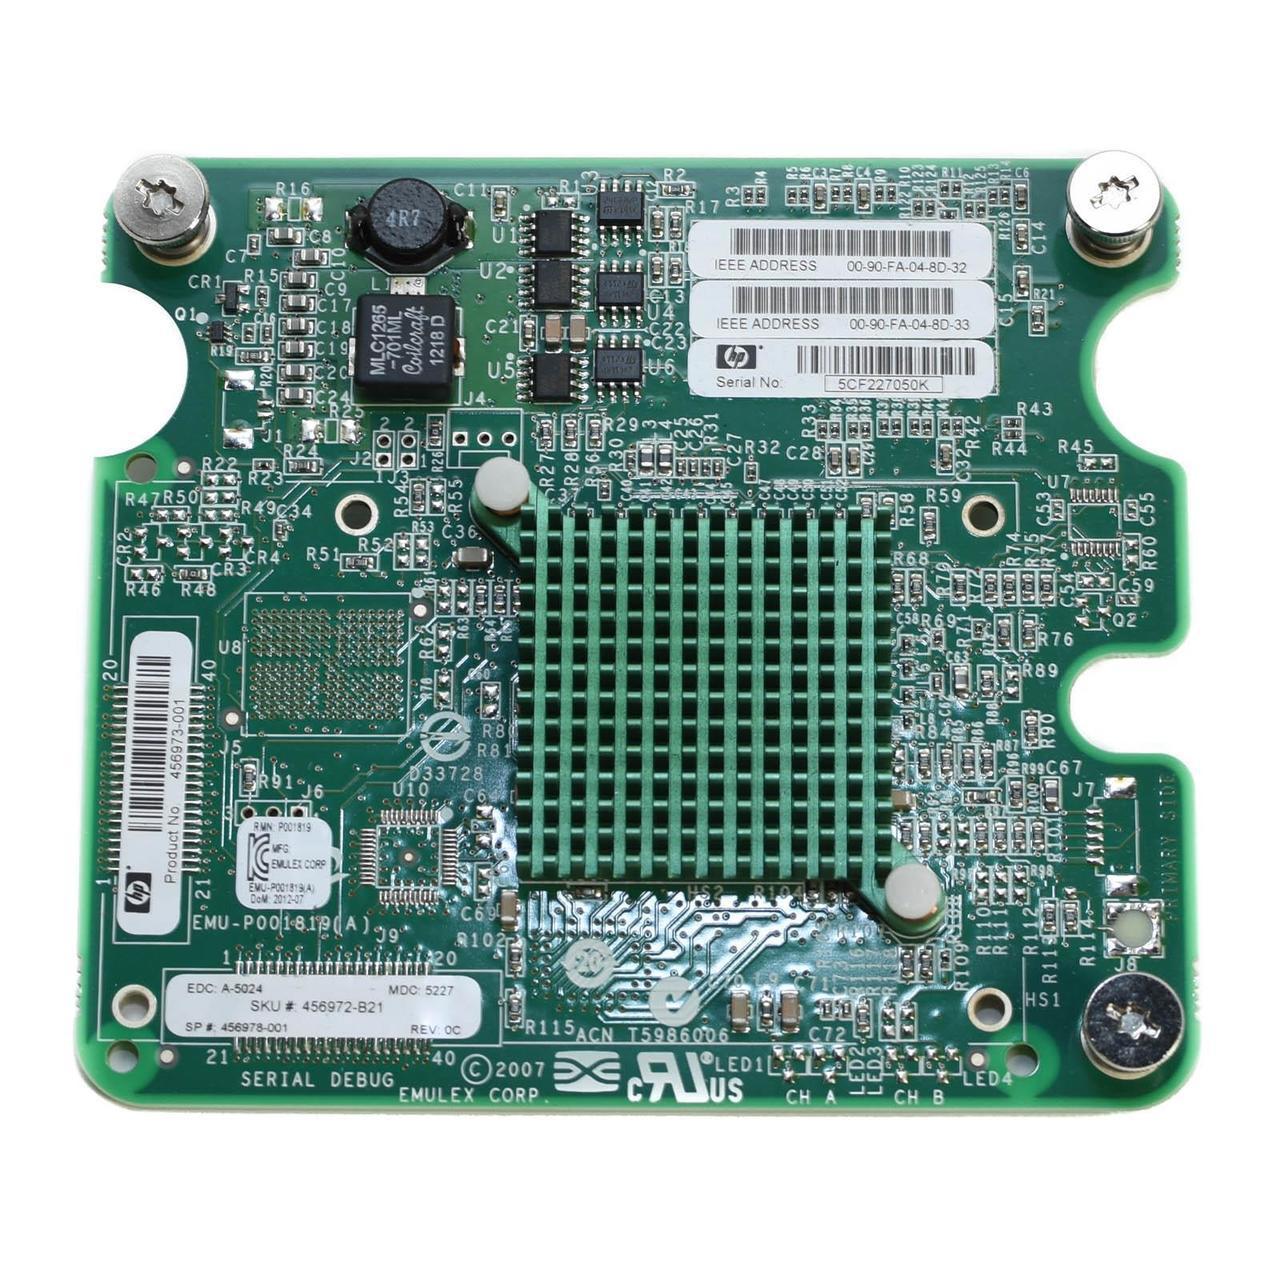 Сетевой mezzanine адаптер LPe1205 8Gb Fibre Channel HBA для HP c-Class блейд-серверов